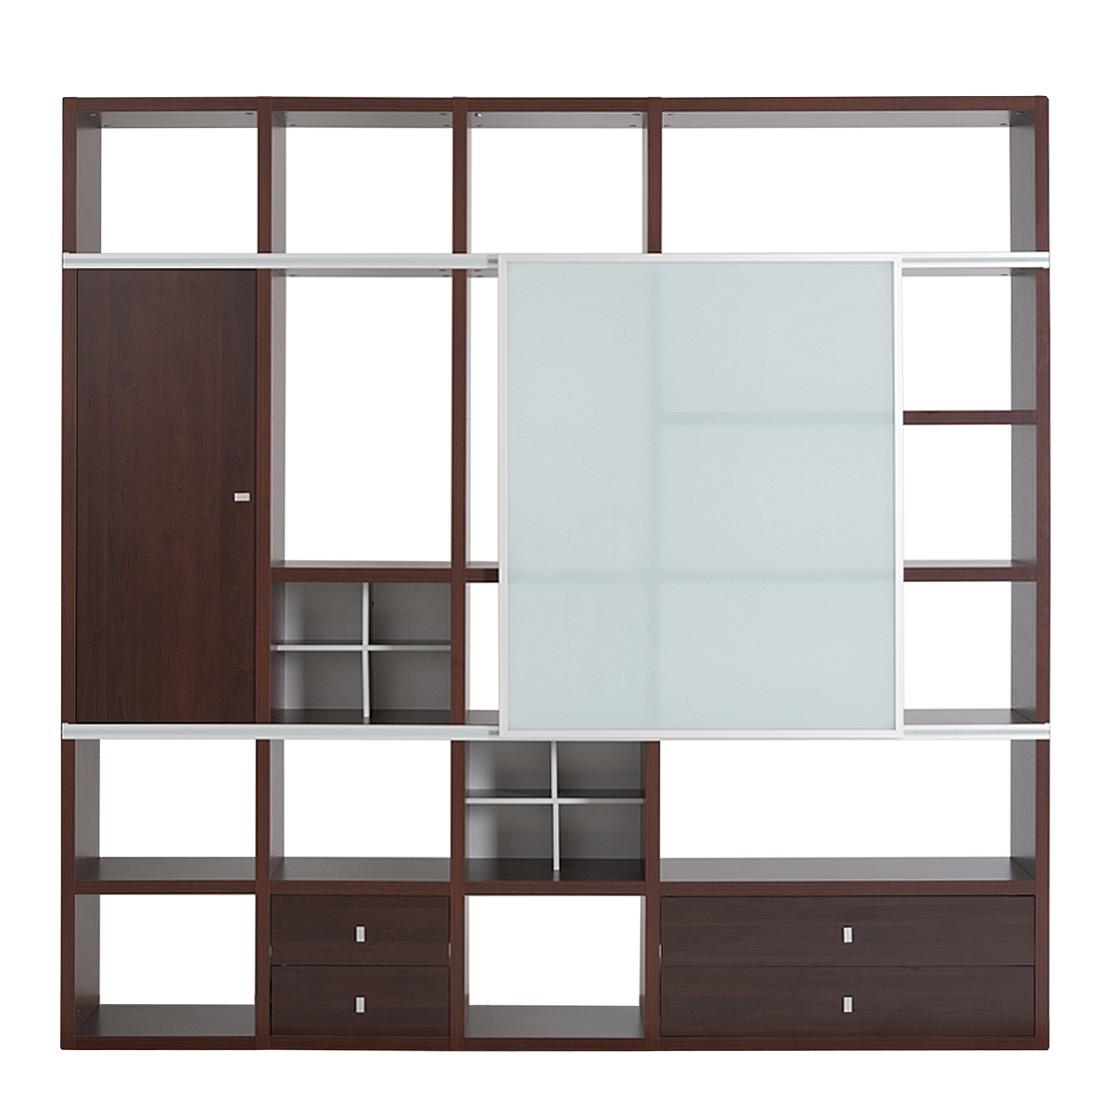 eek a regalwand empire wenge dekor loftscape m fi. Black Bedroom Furniture Sets. Home Design Ideas